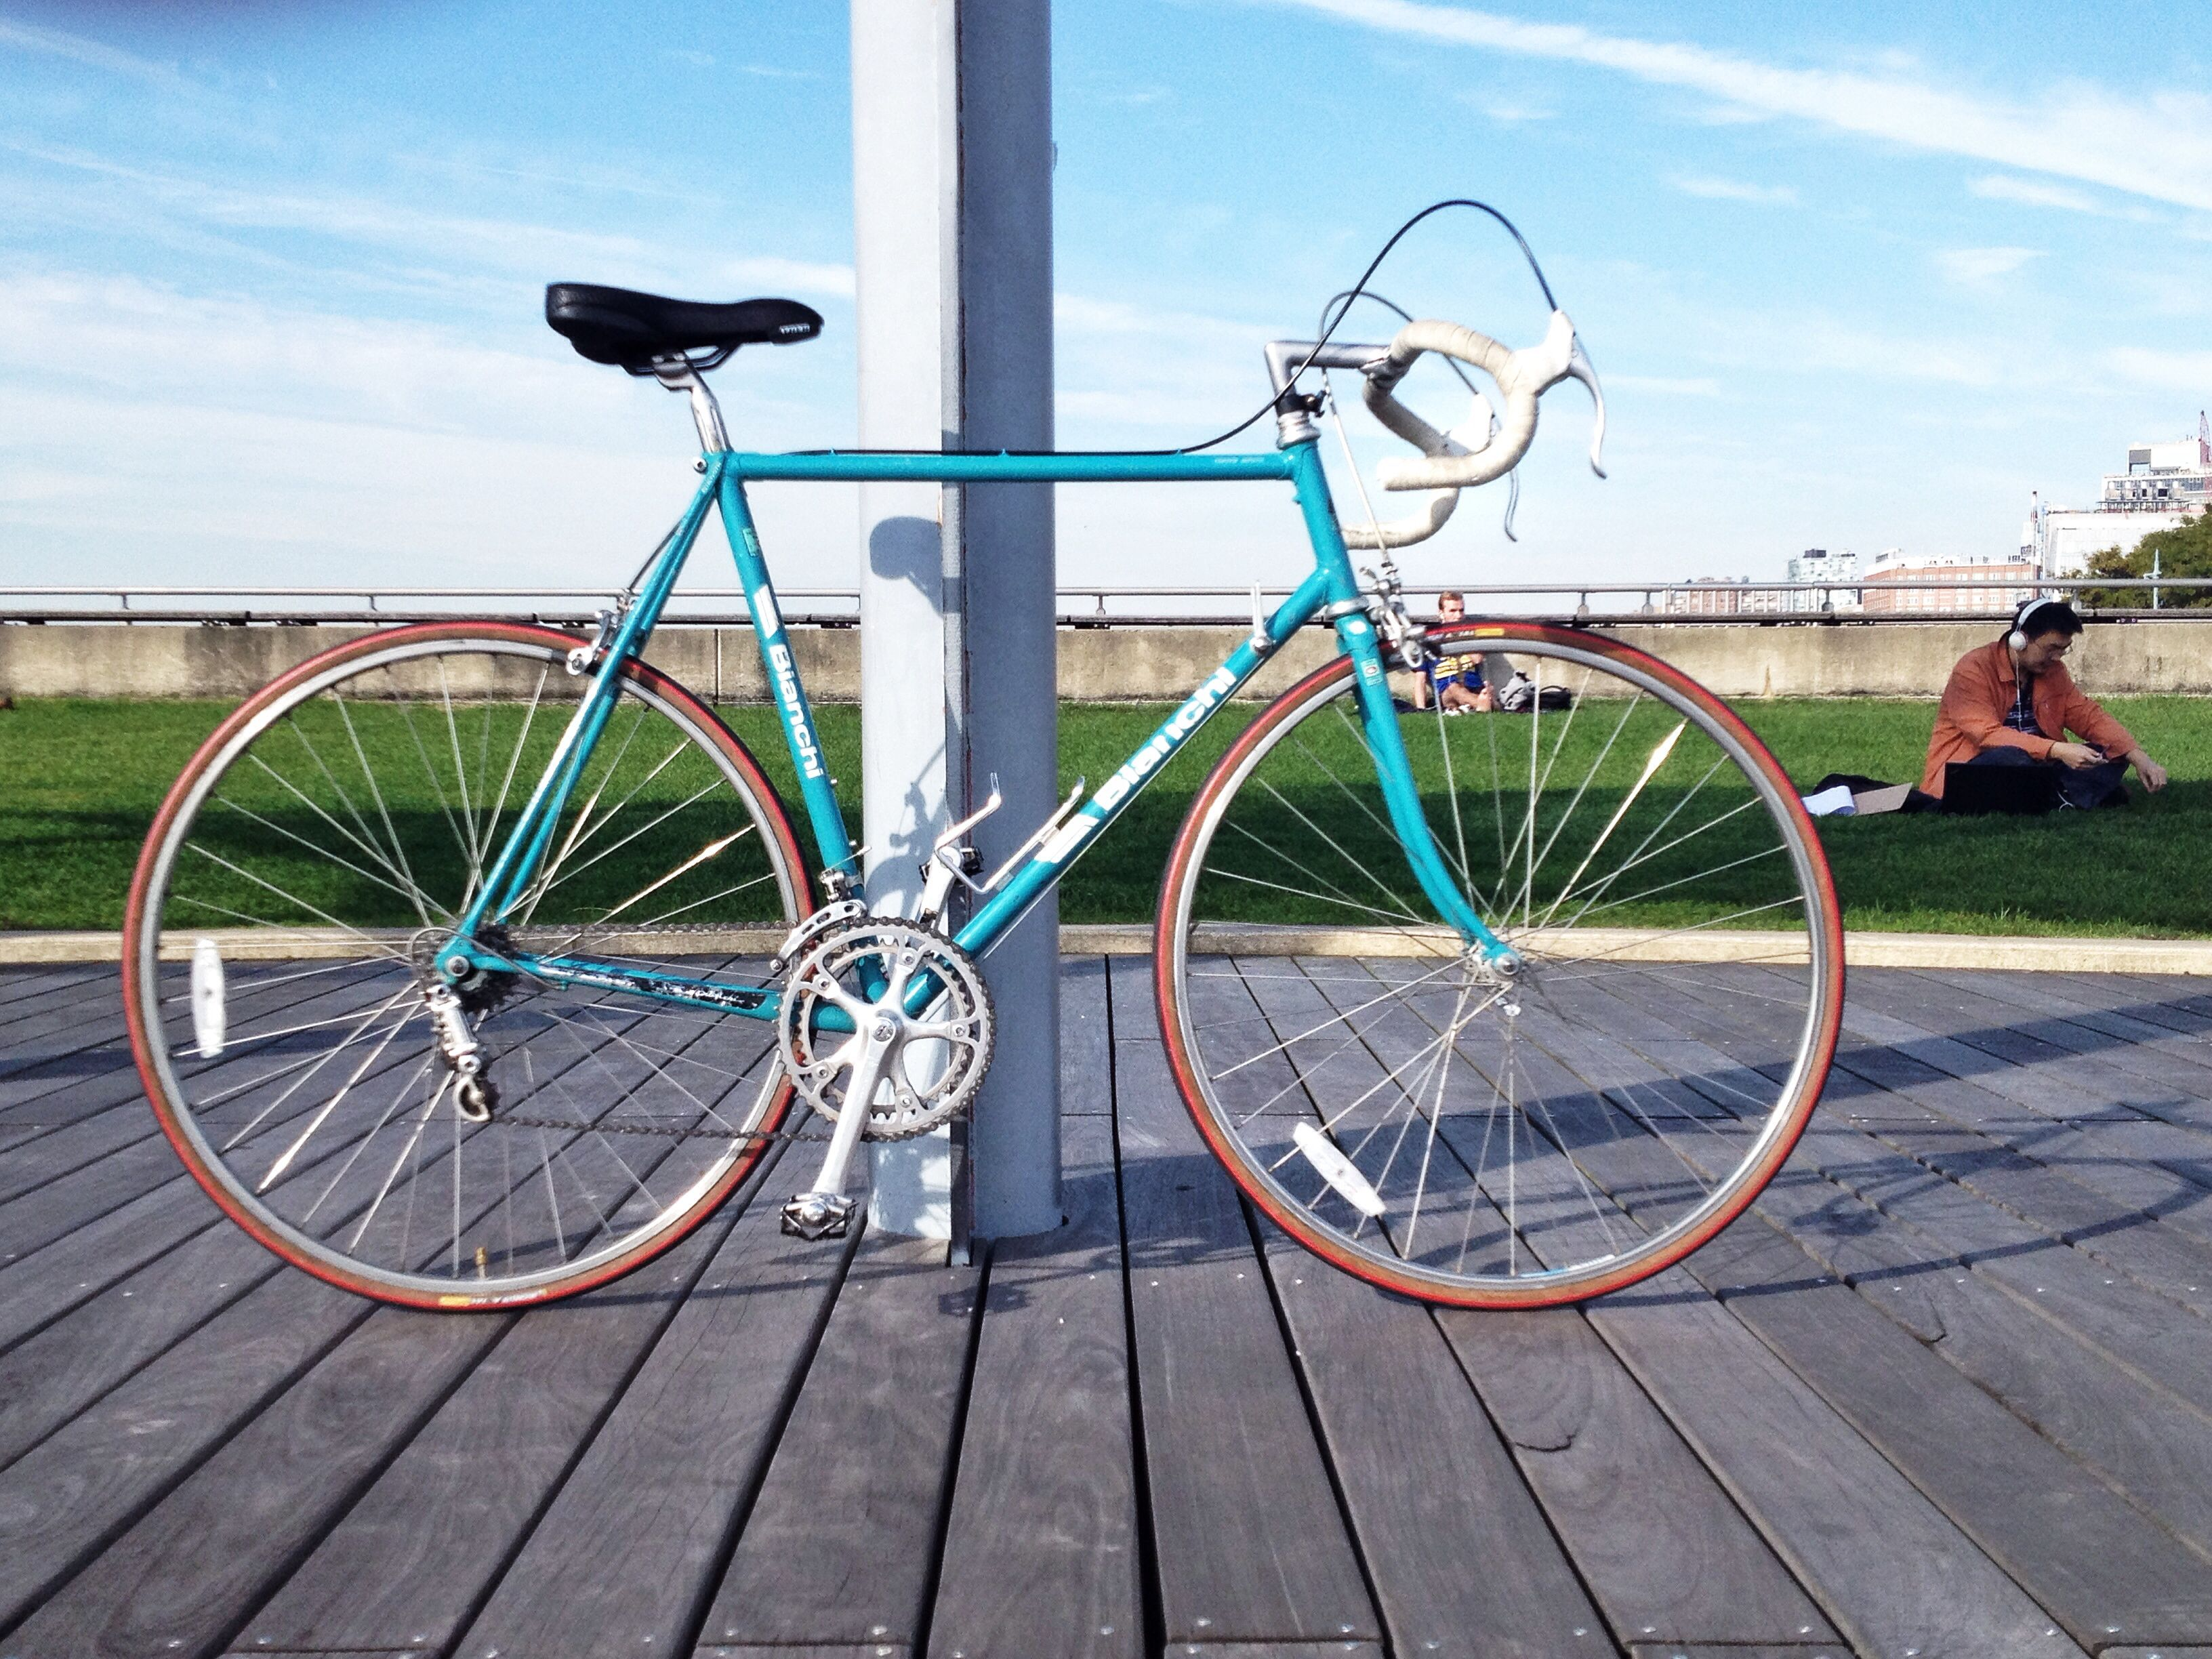 Bianchi Nuovo Alloro A Great Craigslist Find Road Bike Vintage Road Bikes Bike